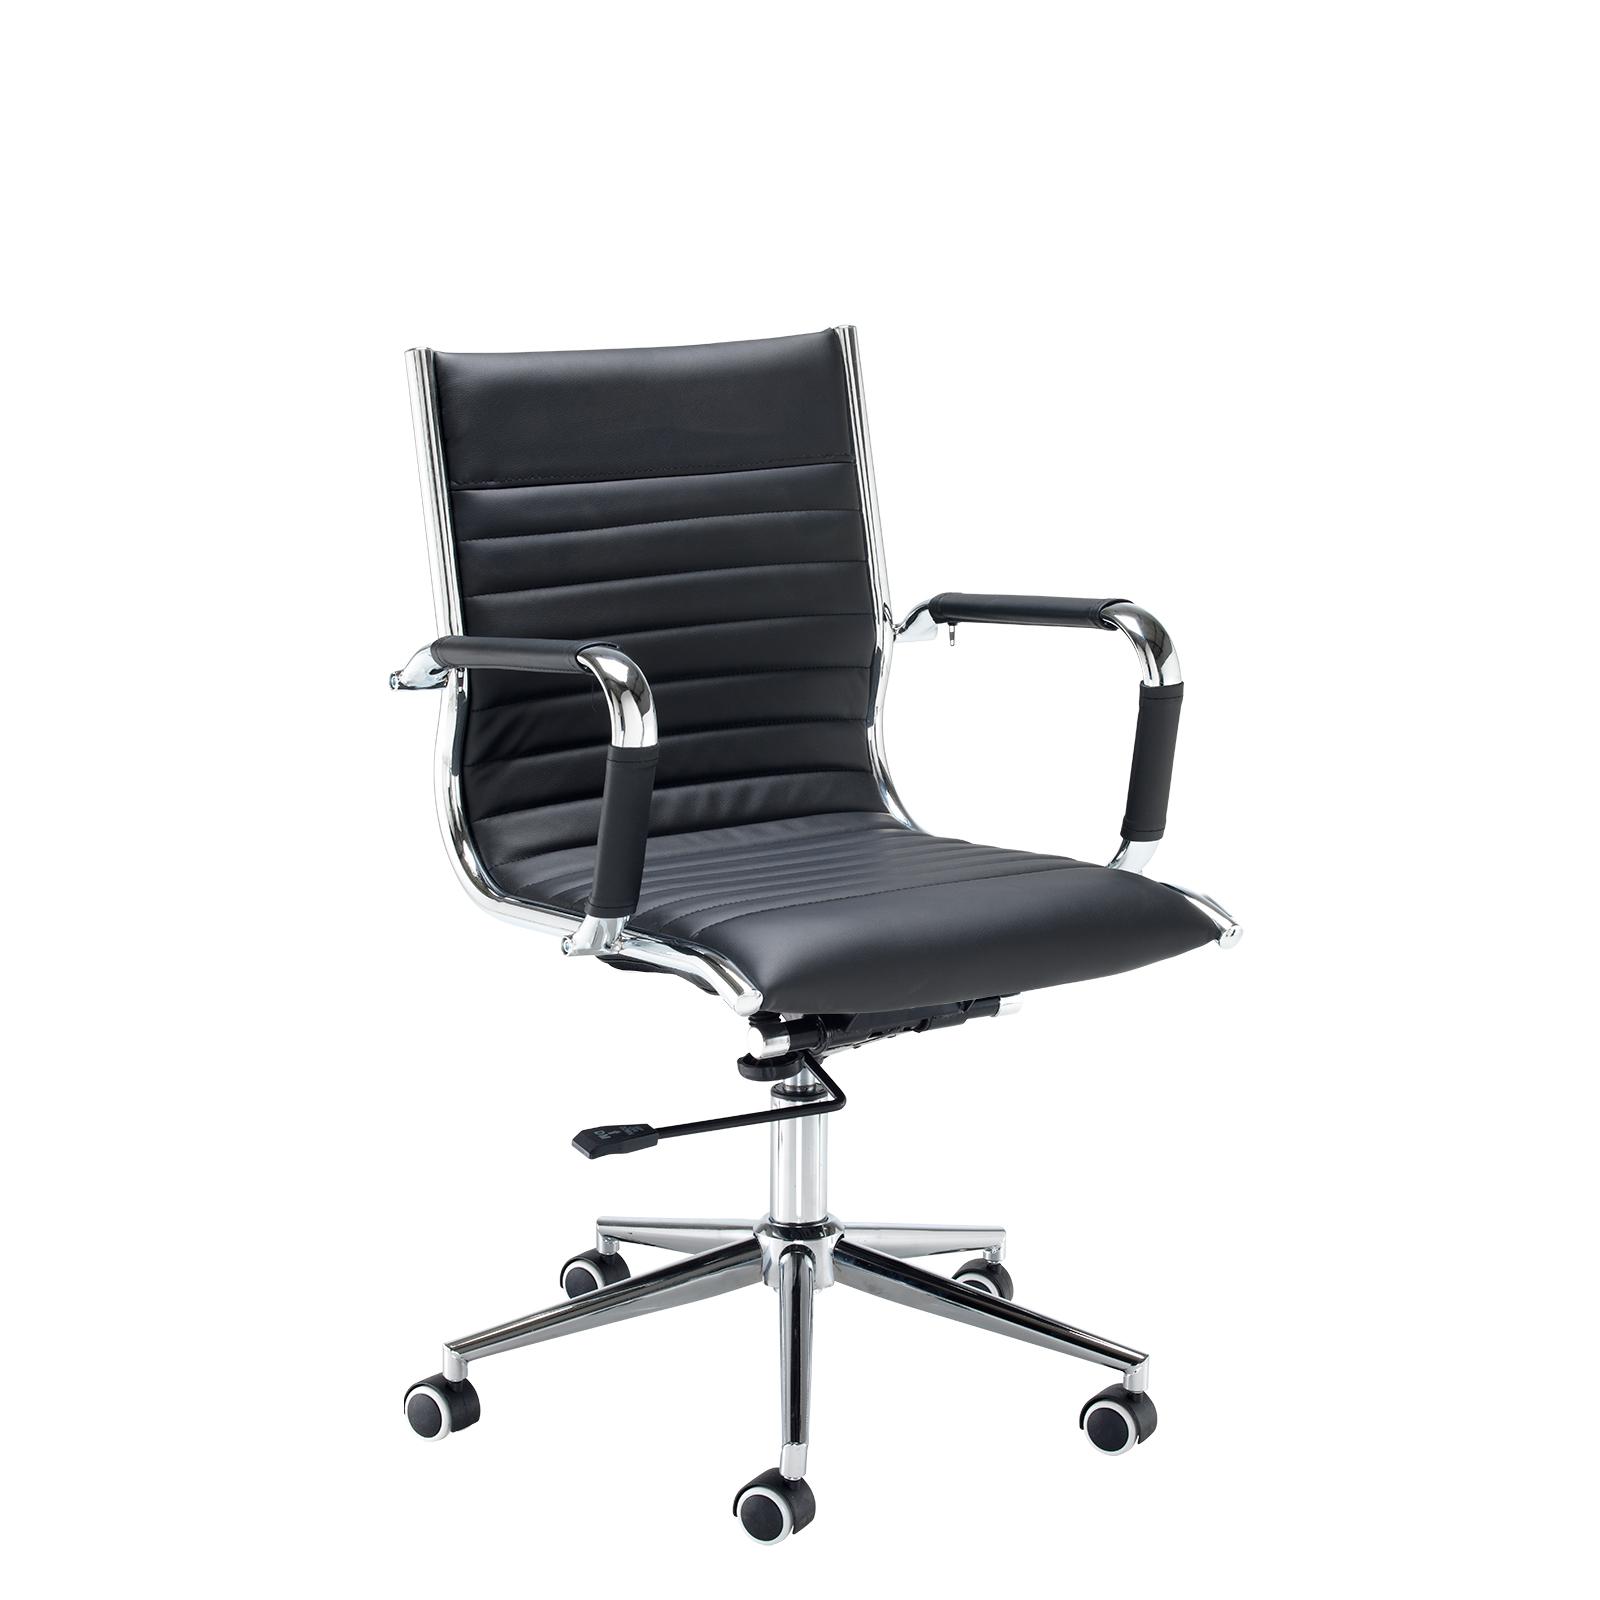 Bari medium back executive chair